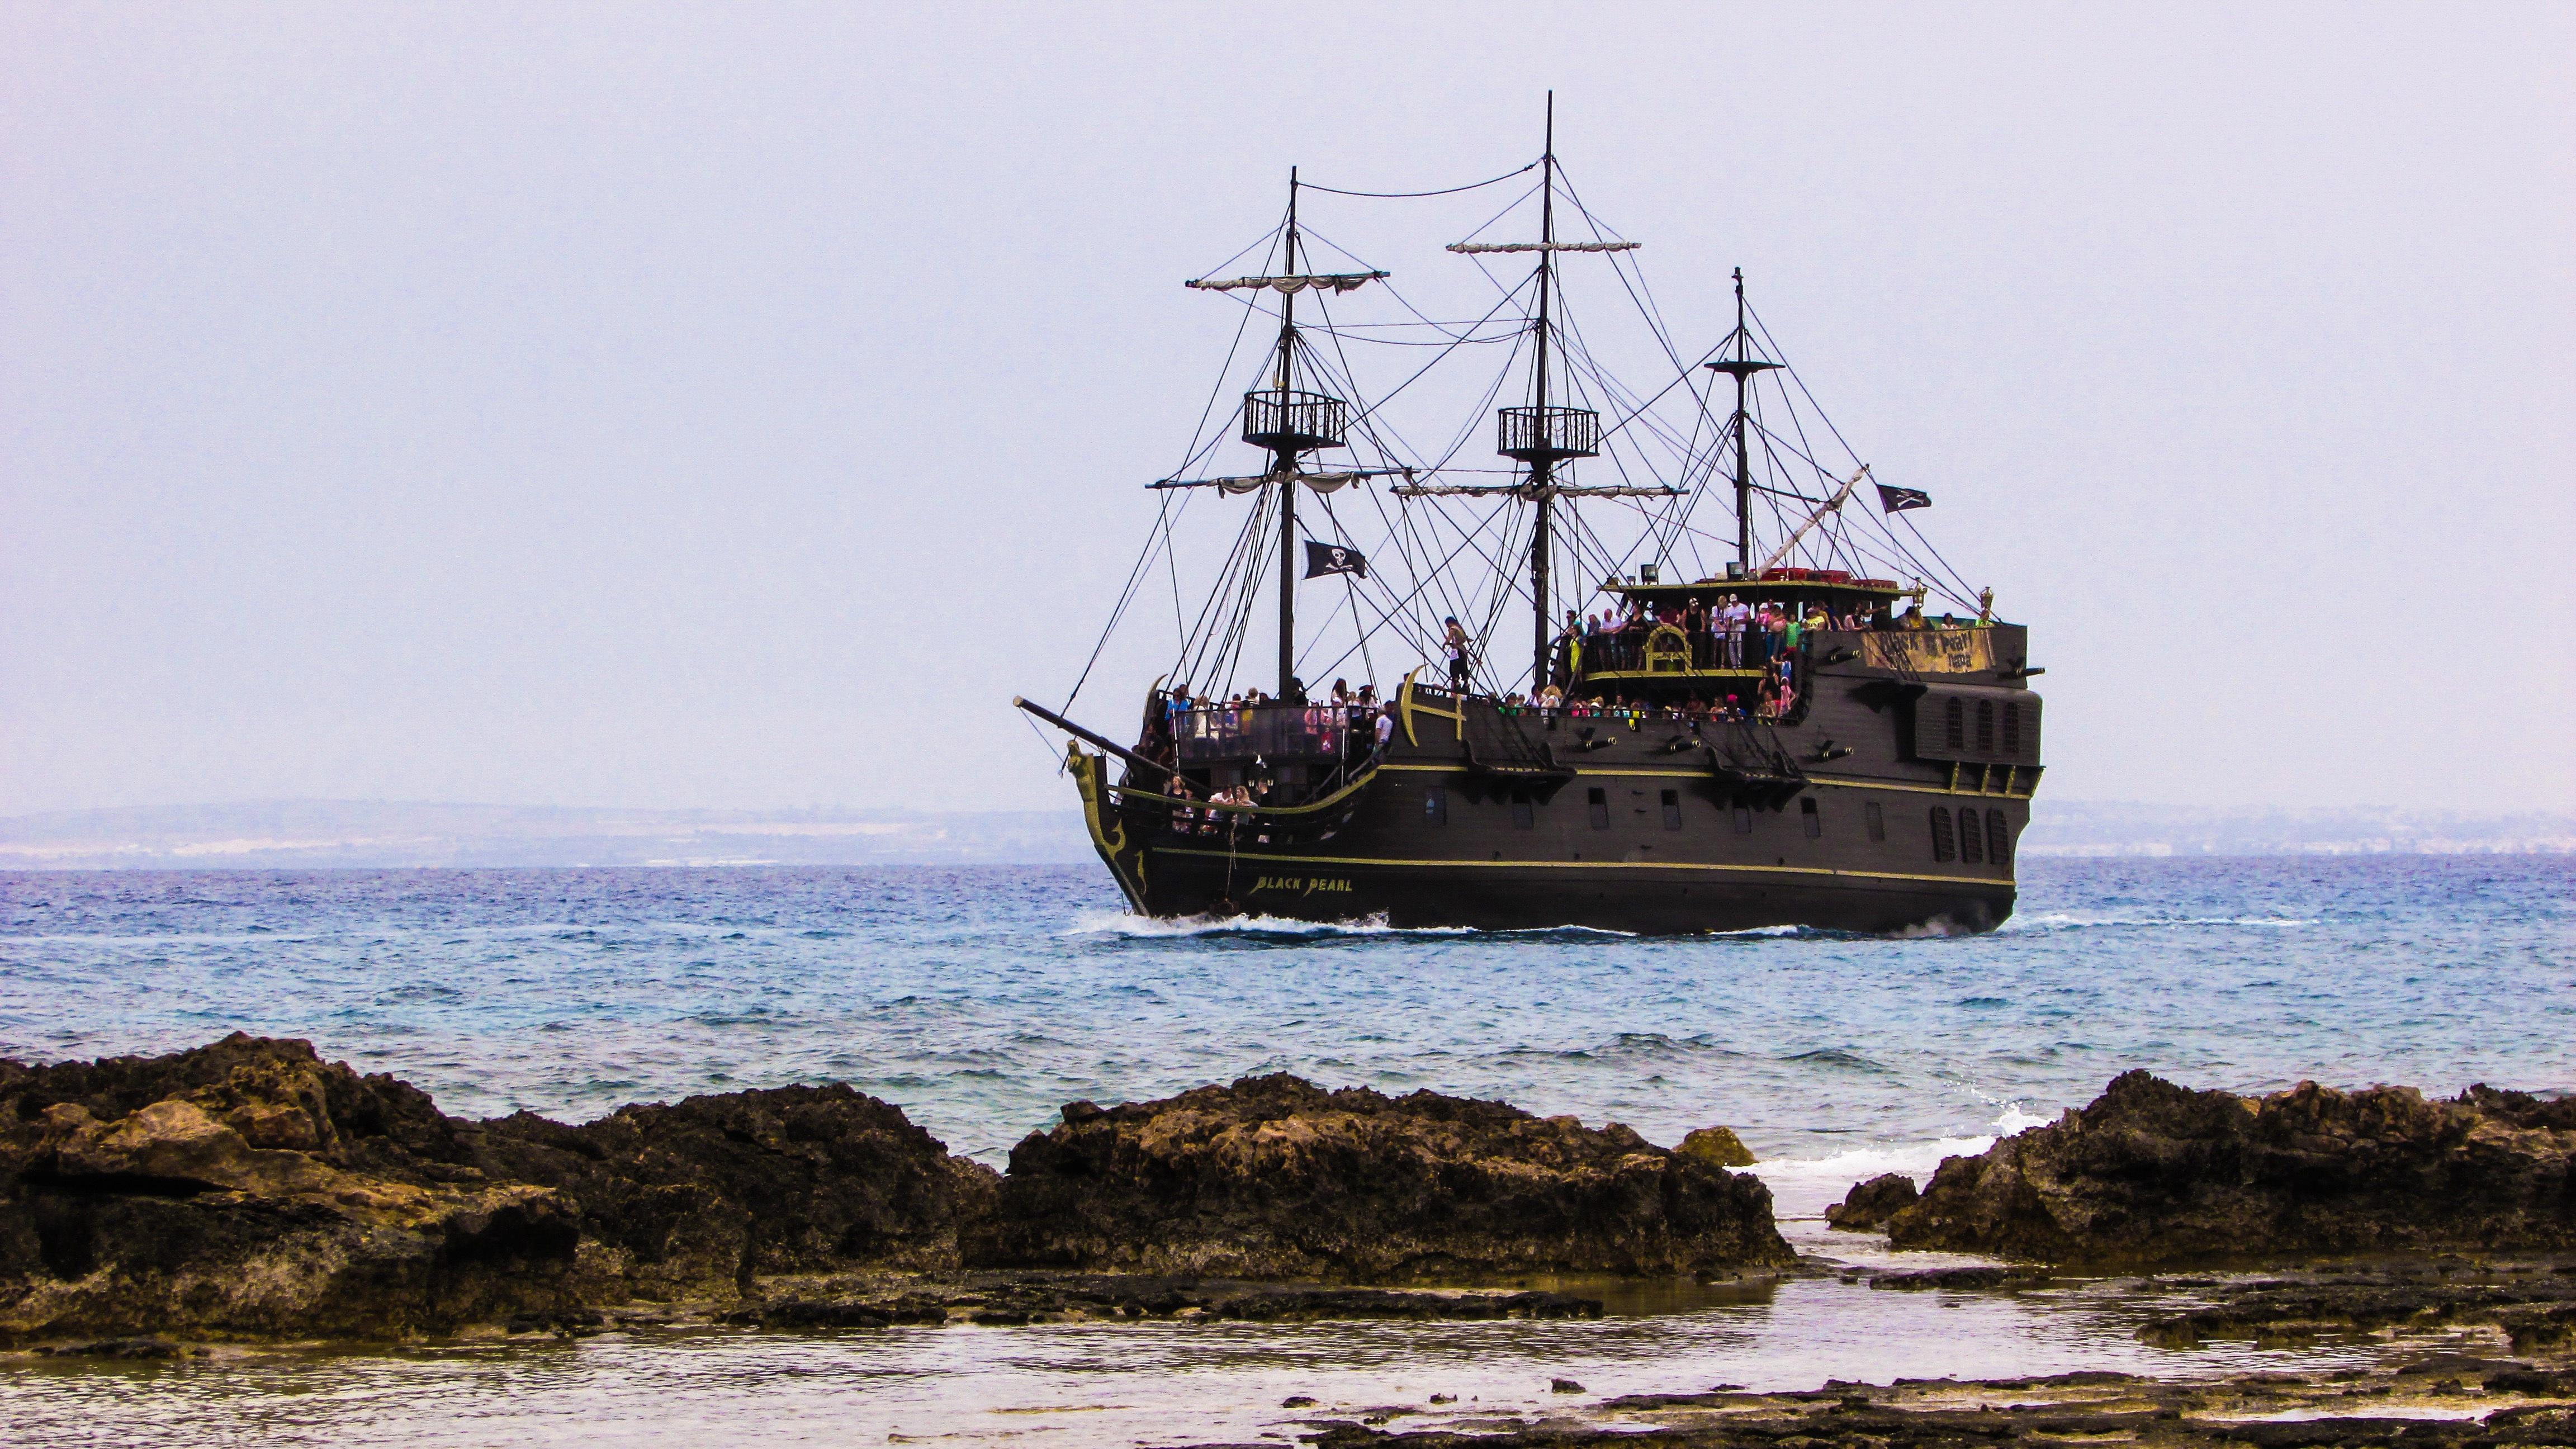 free images sea coast ocean boat vehicle bay tourism